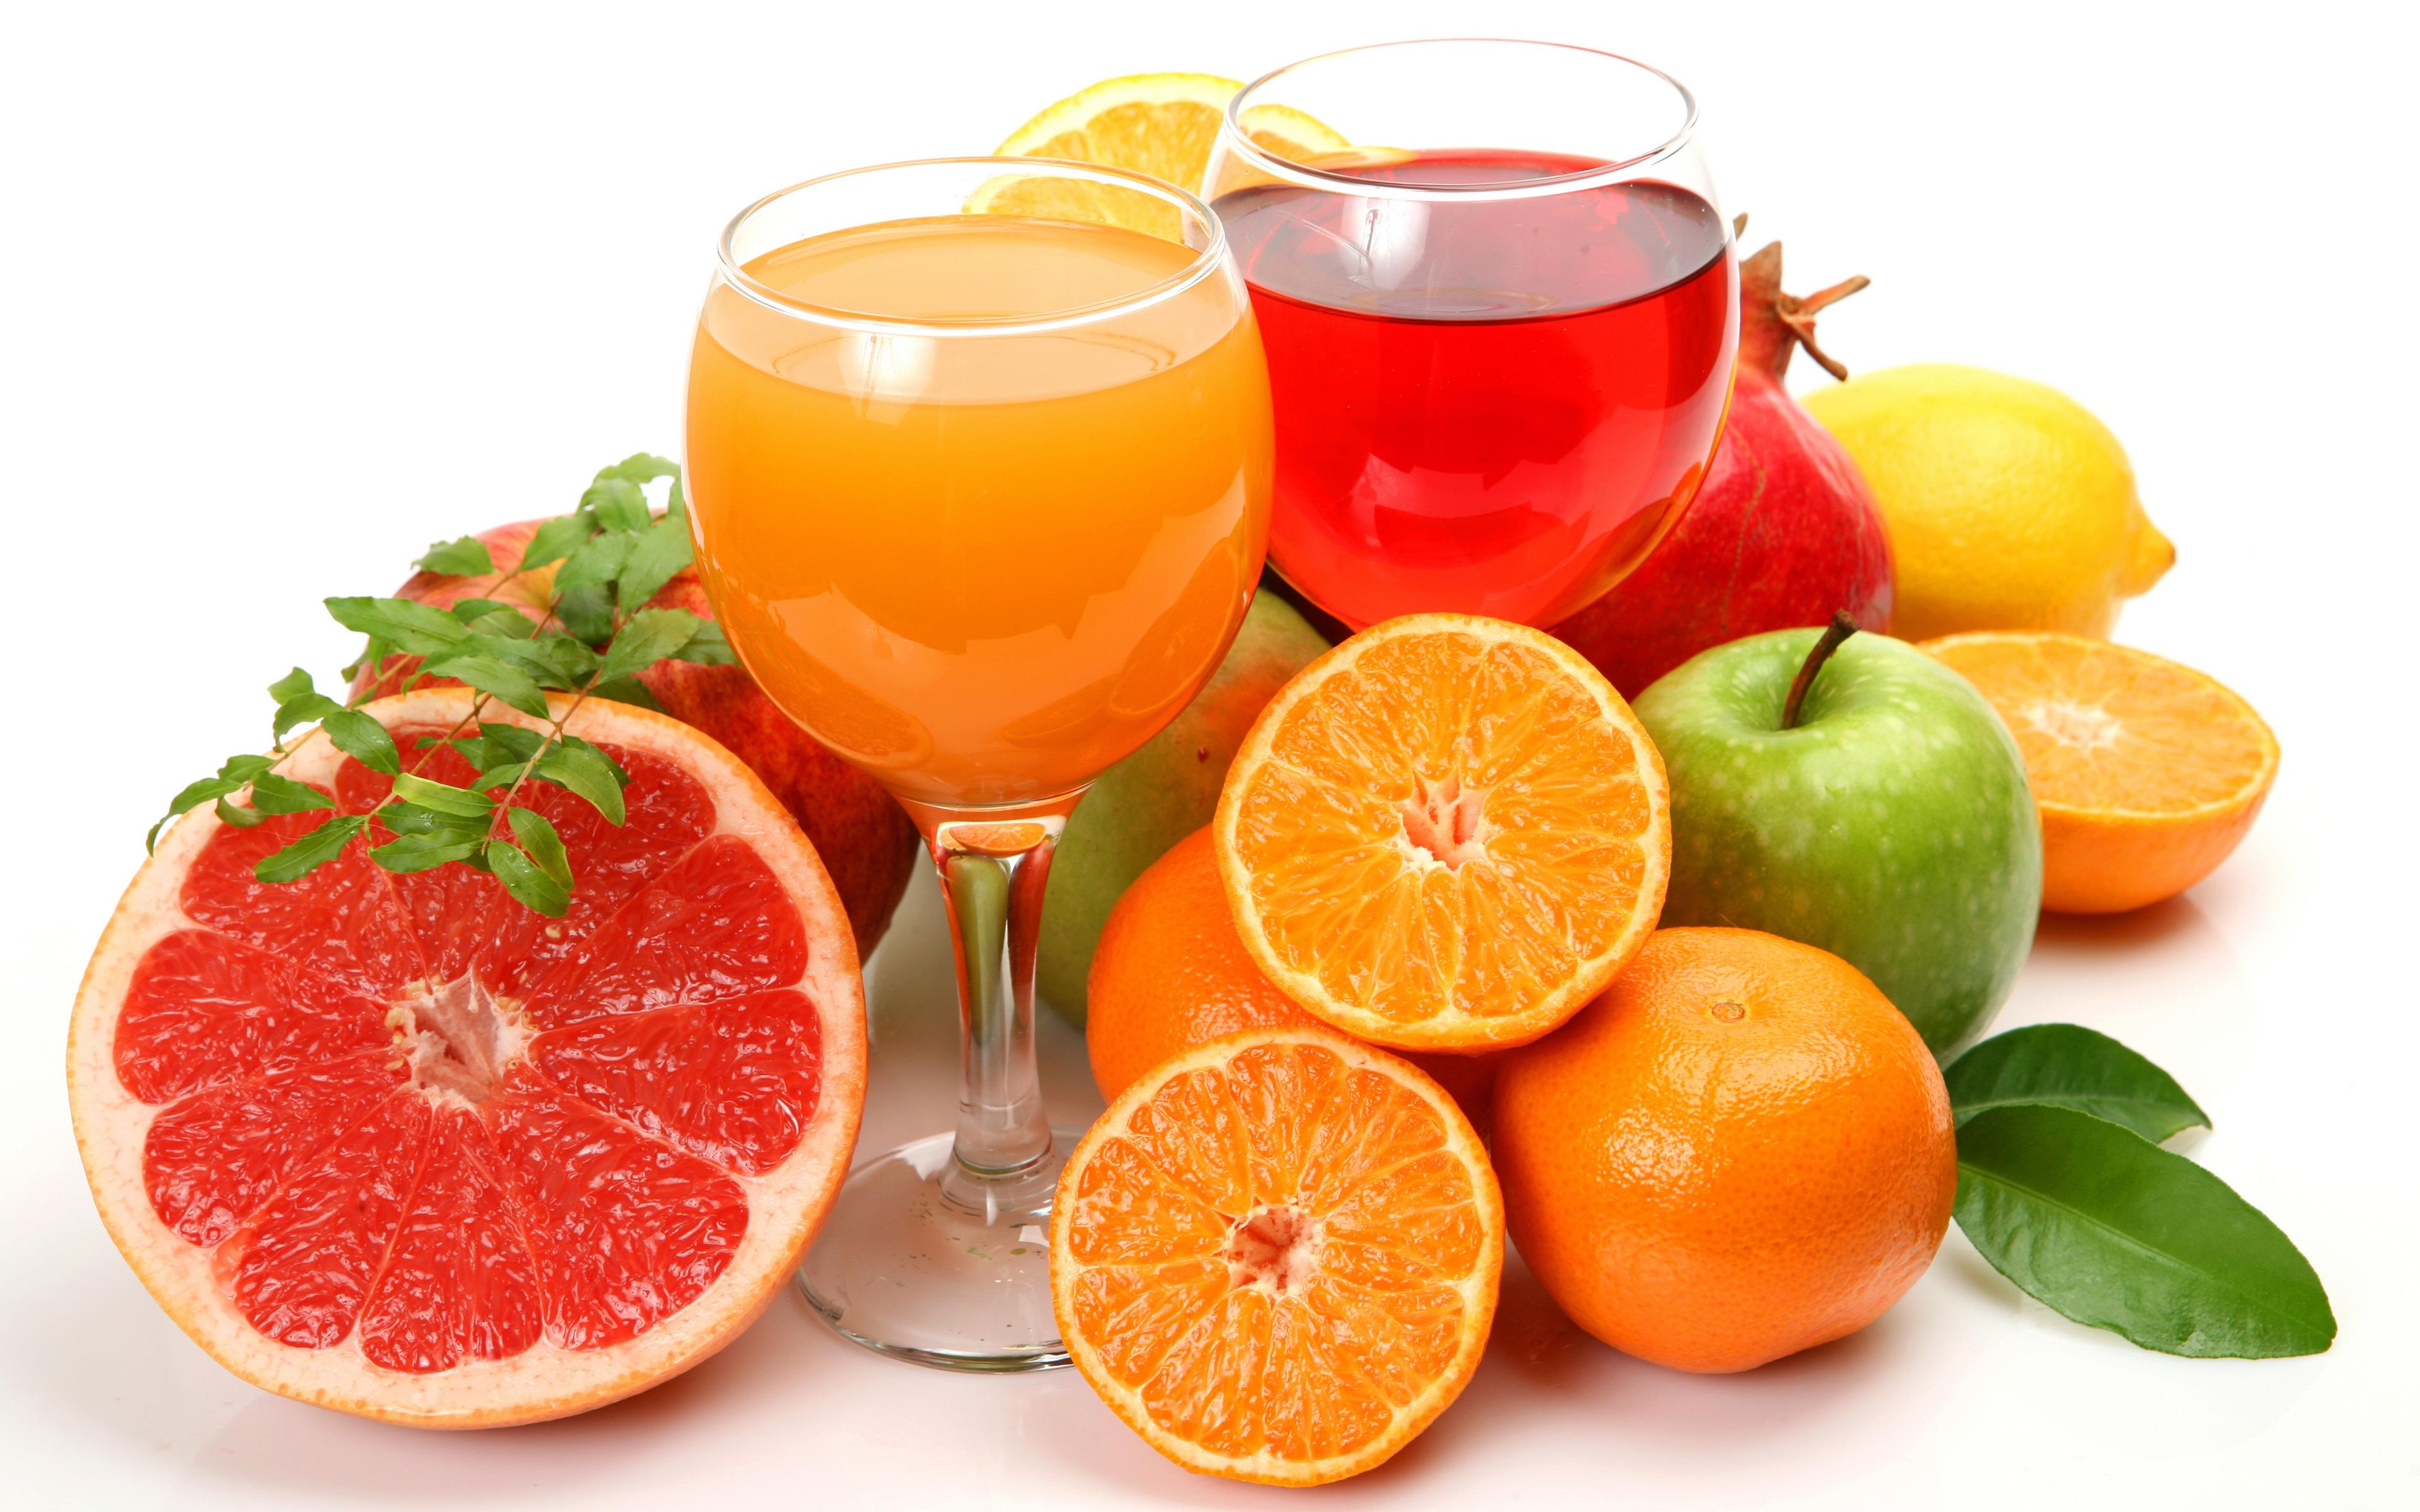 fresh-fruit-juice-3840x2400-wide-wallpapers.net_